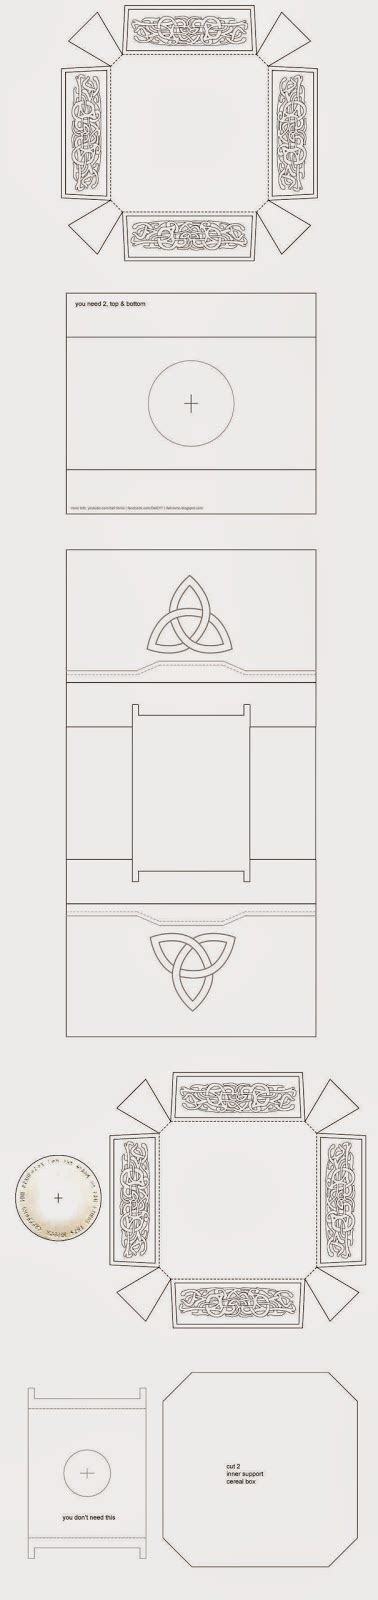 Thor Hammer Printable Template Dali Lomo Thor Hammer Mj 246 Lnir Cardboard Diy Free Template